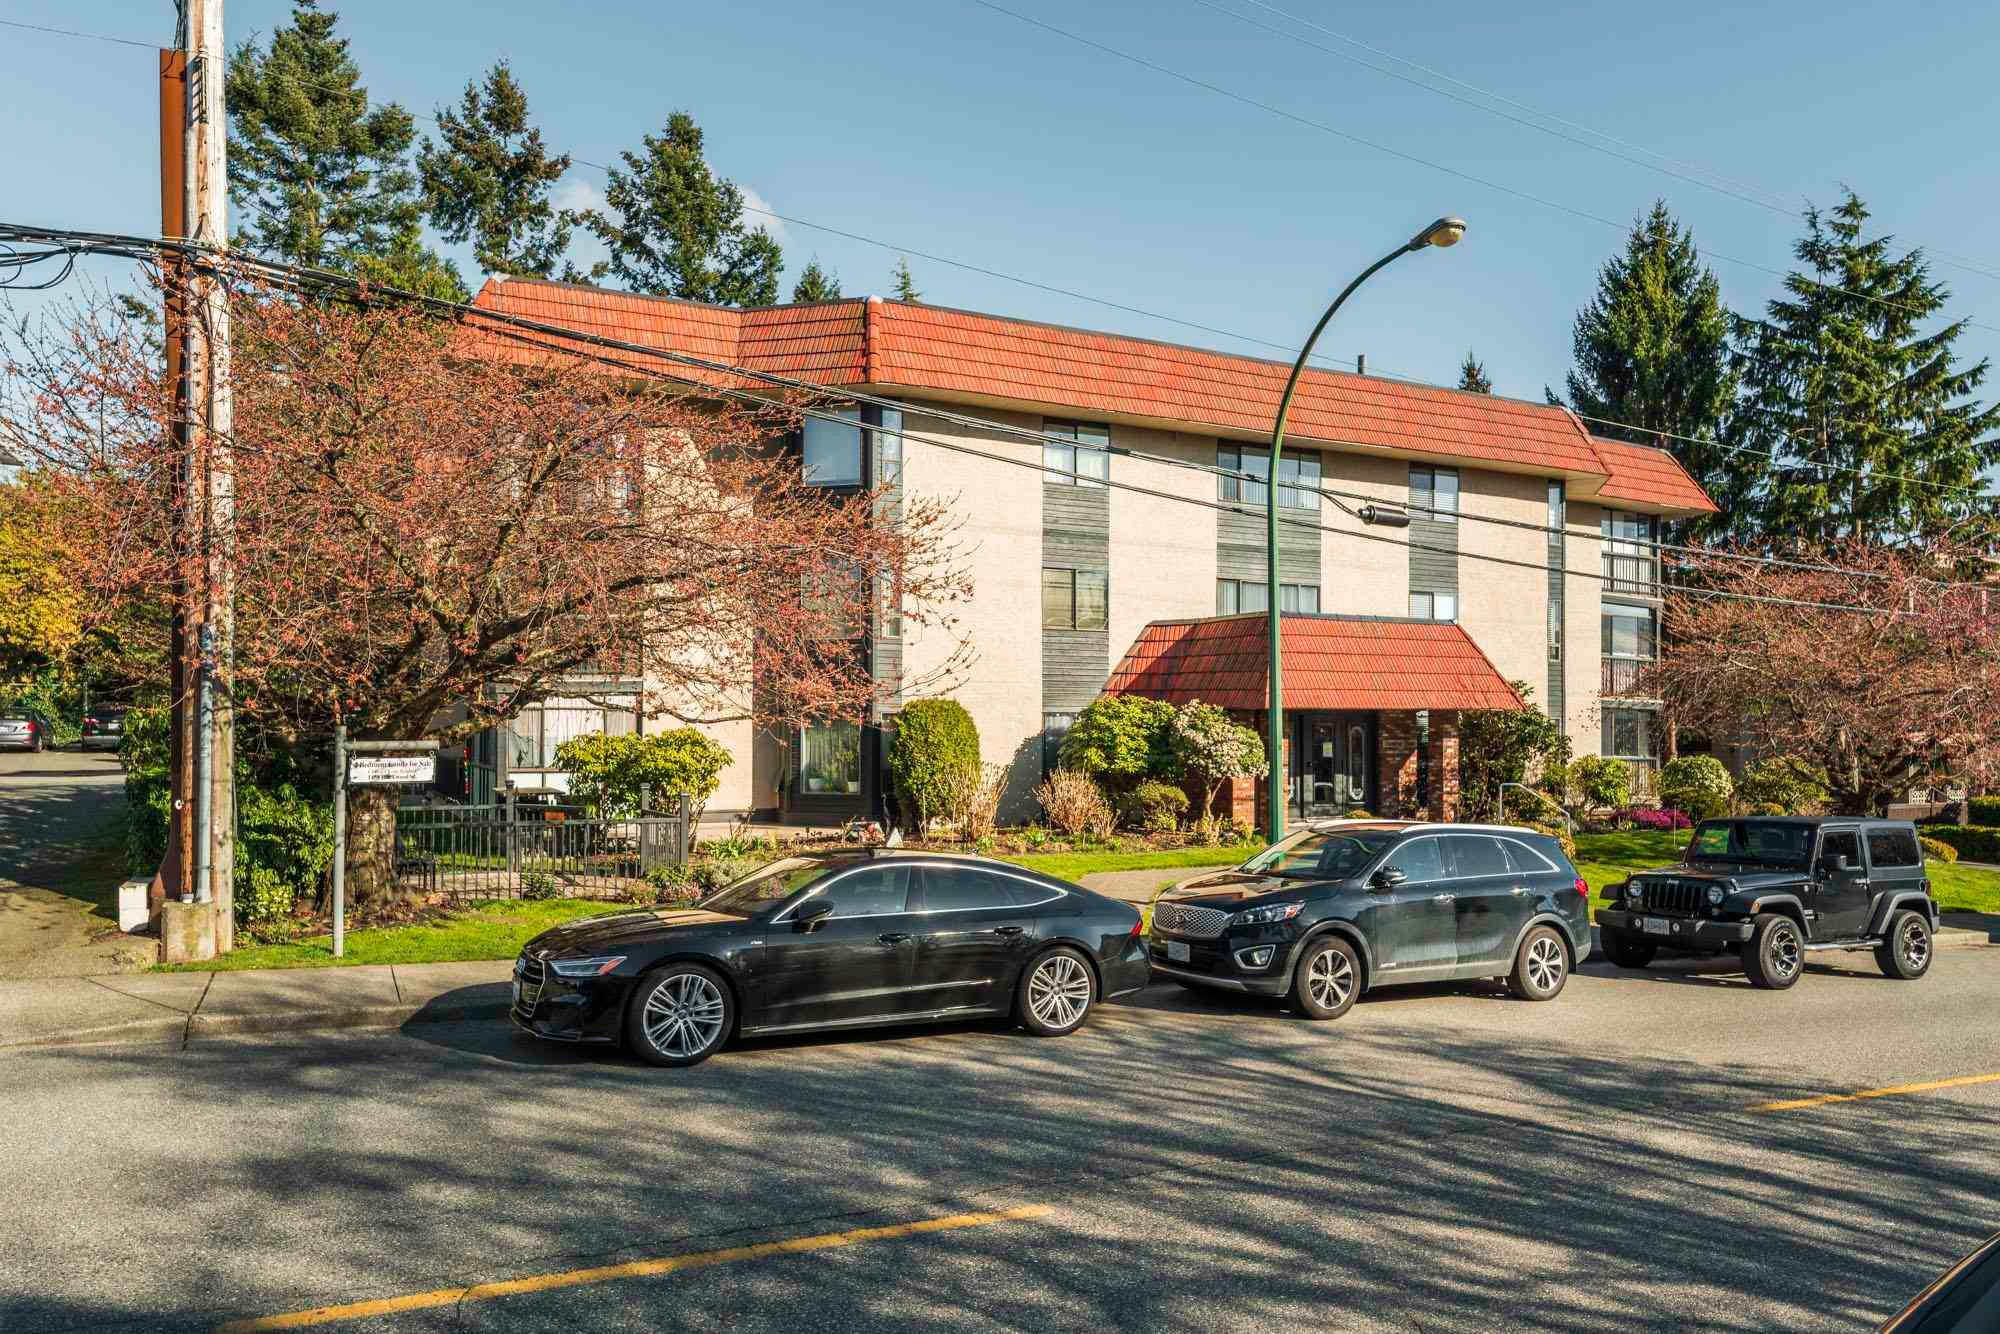 Main Photo: 202 1458 BLACKWOOD Street: White Rock Condo for sale (South Surrey White Rock)  : MLS®# R2595424